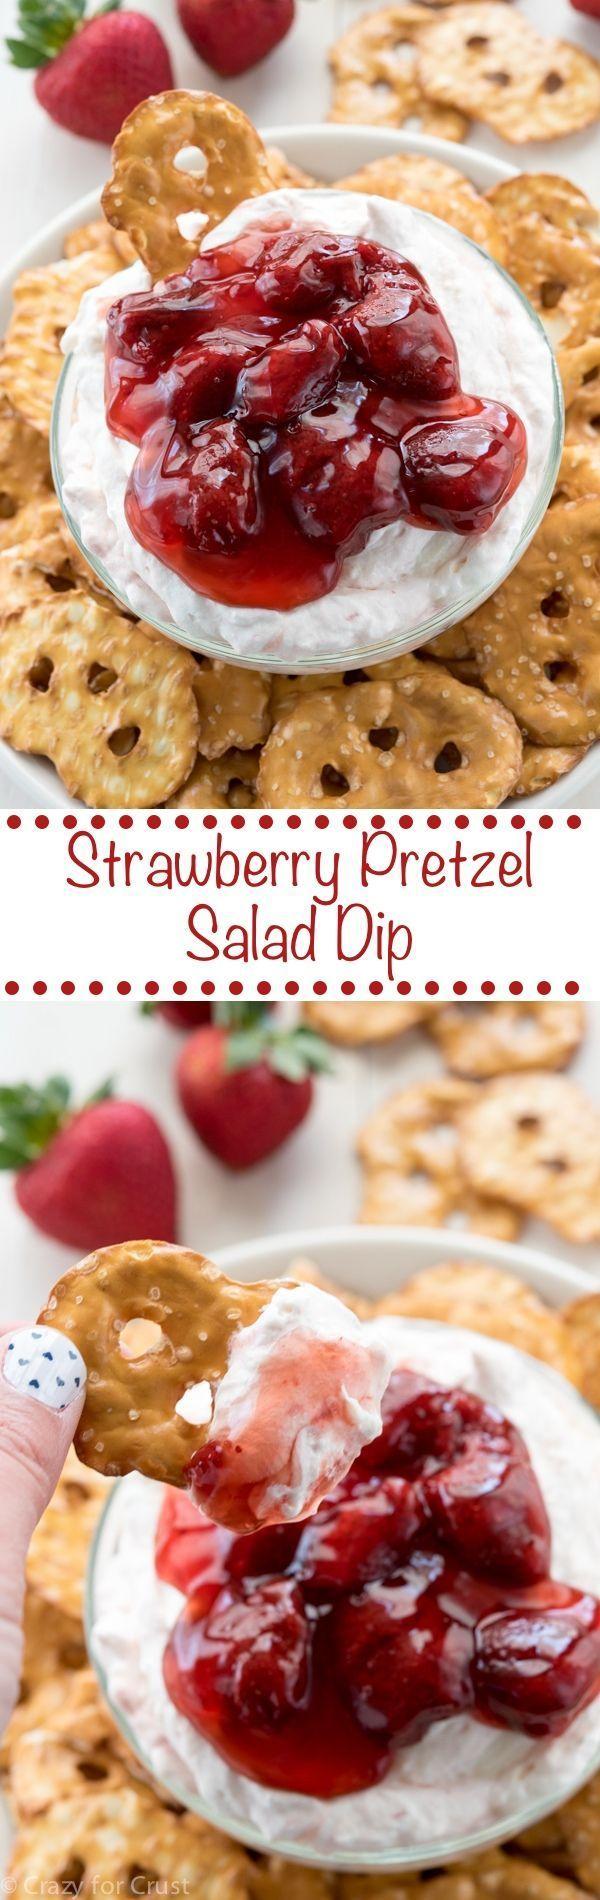 Strawberry Pretzel Salad Dip